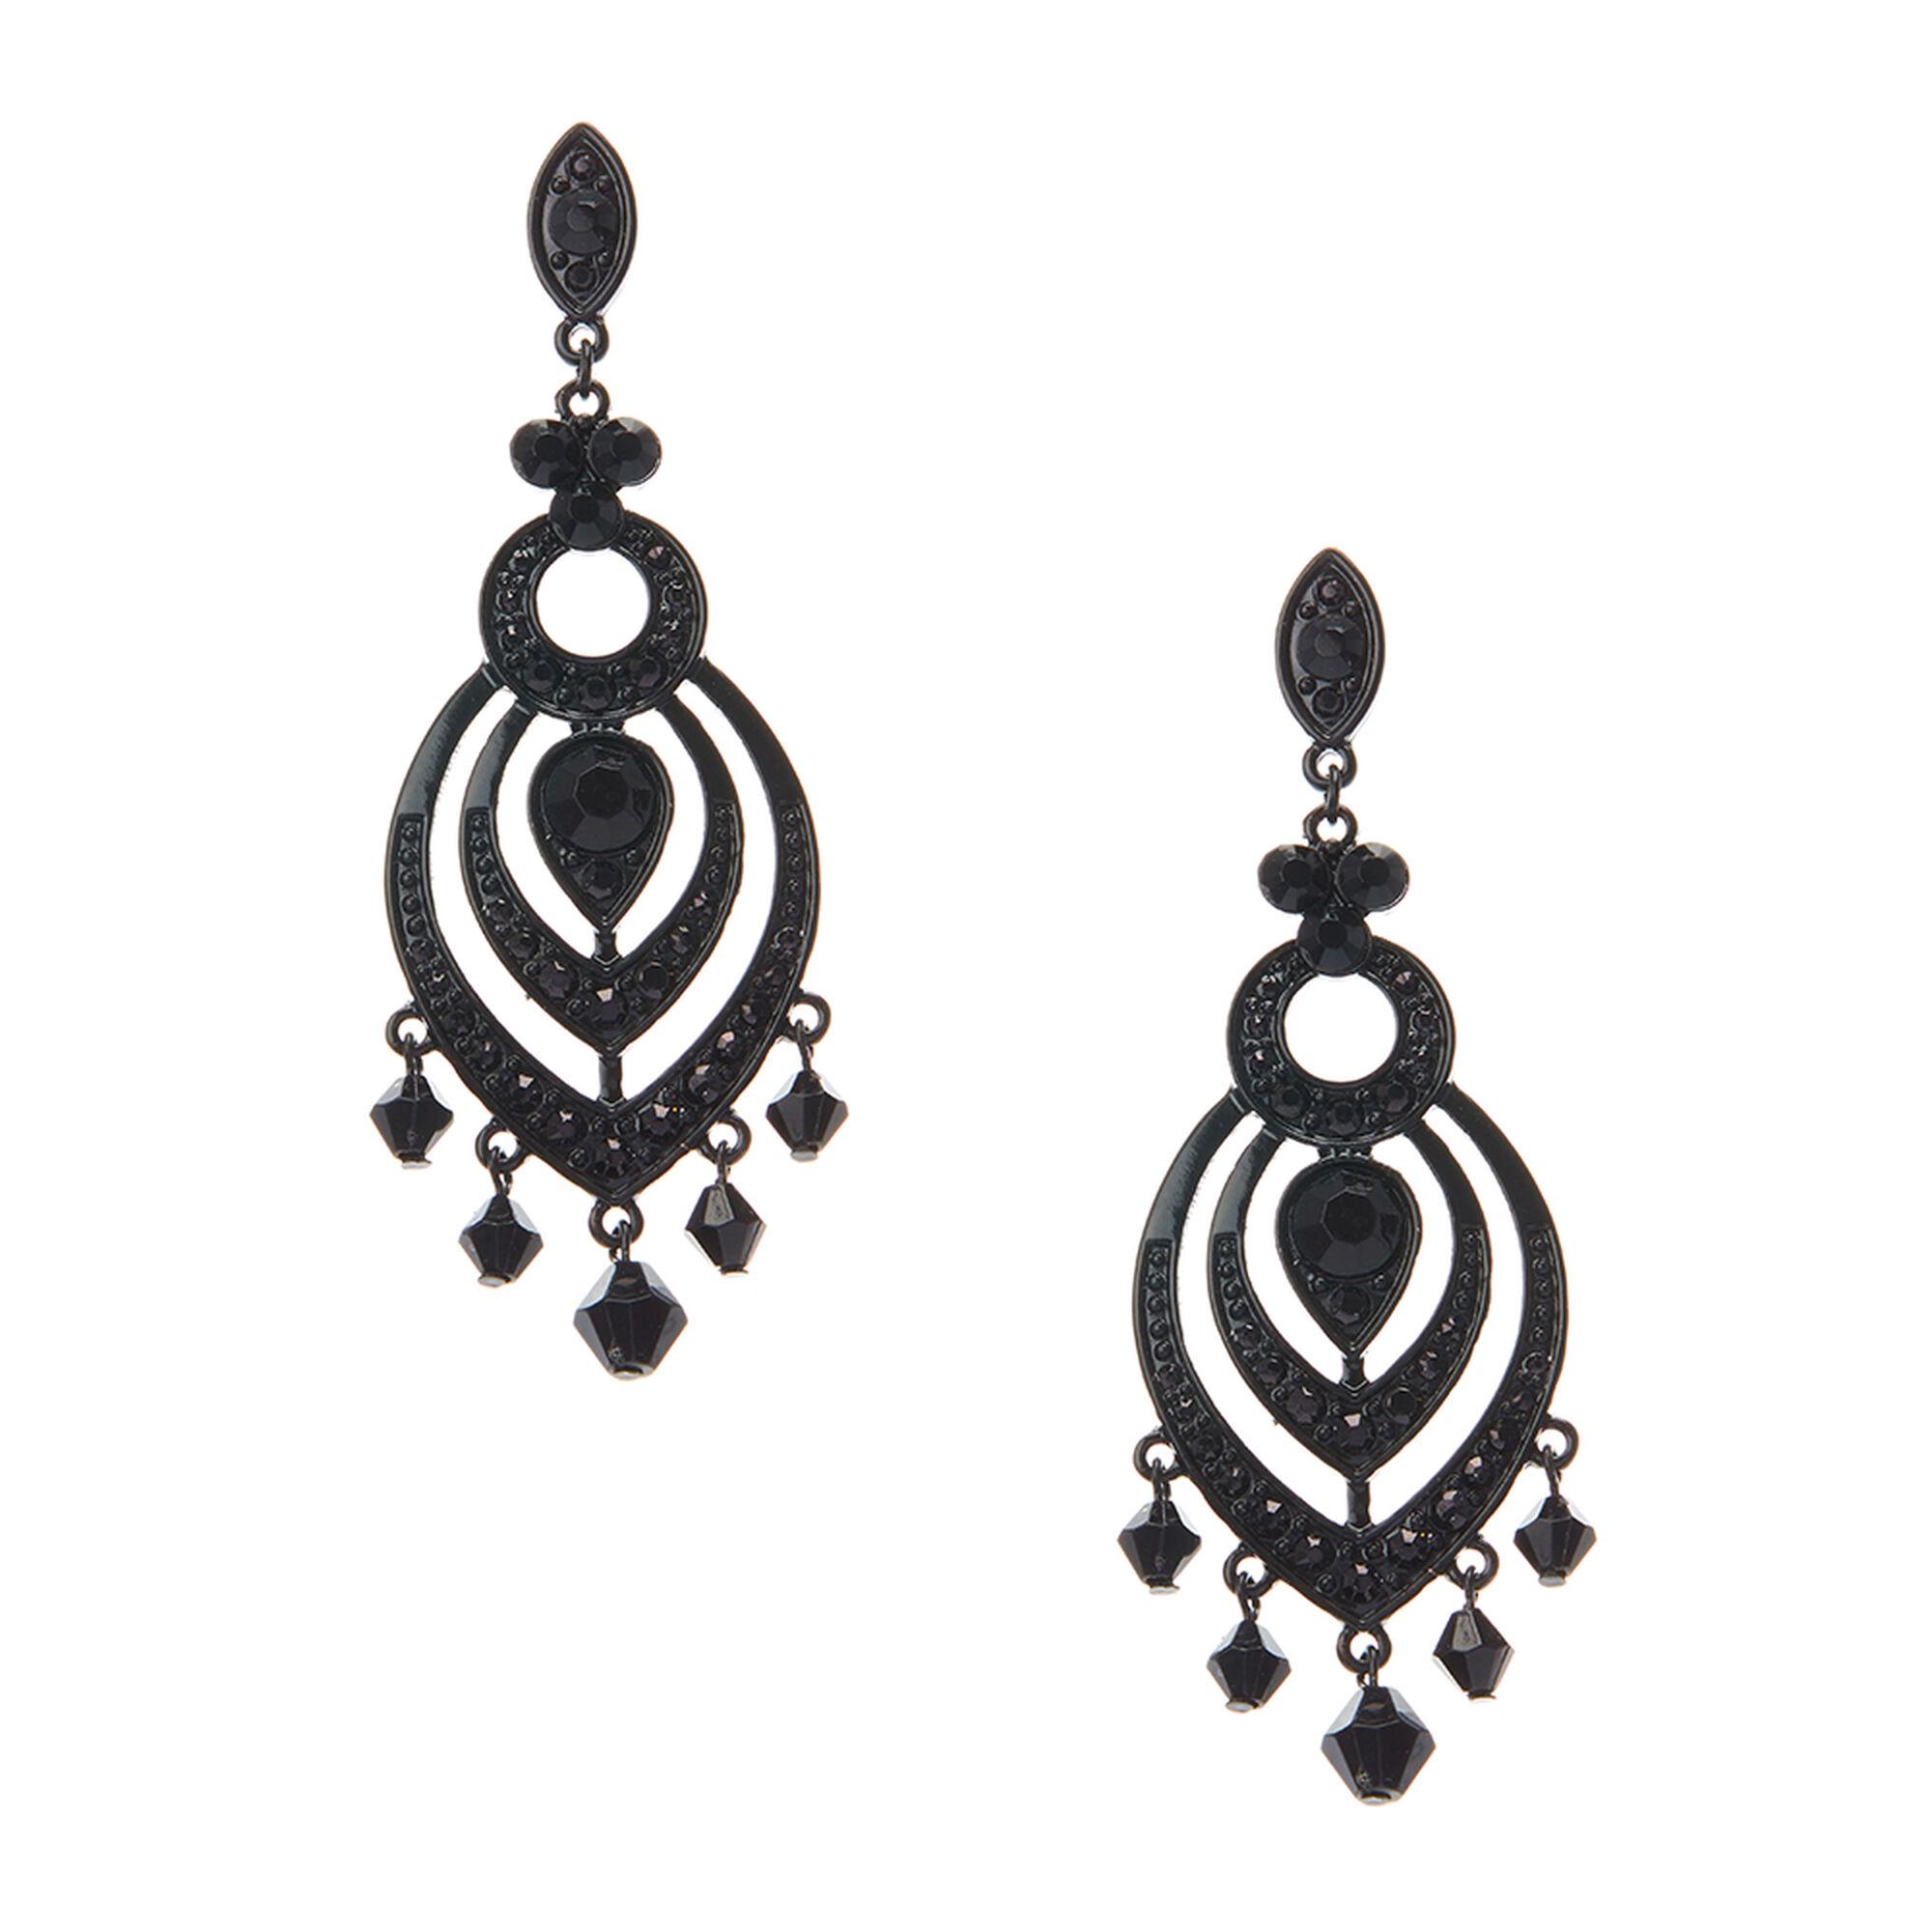 Large jet black chandelier drop earrings claires large jet black chandelier drop earrings arubaitofo Images